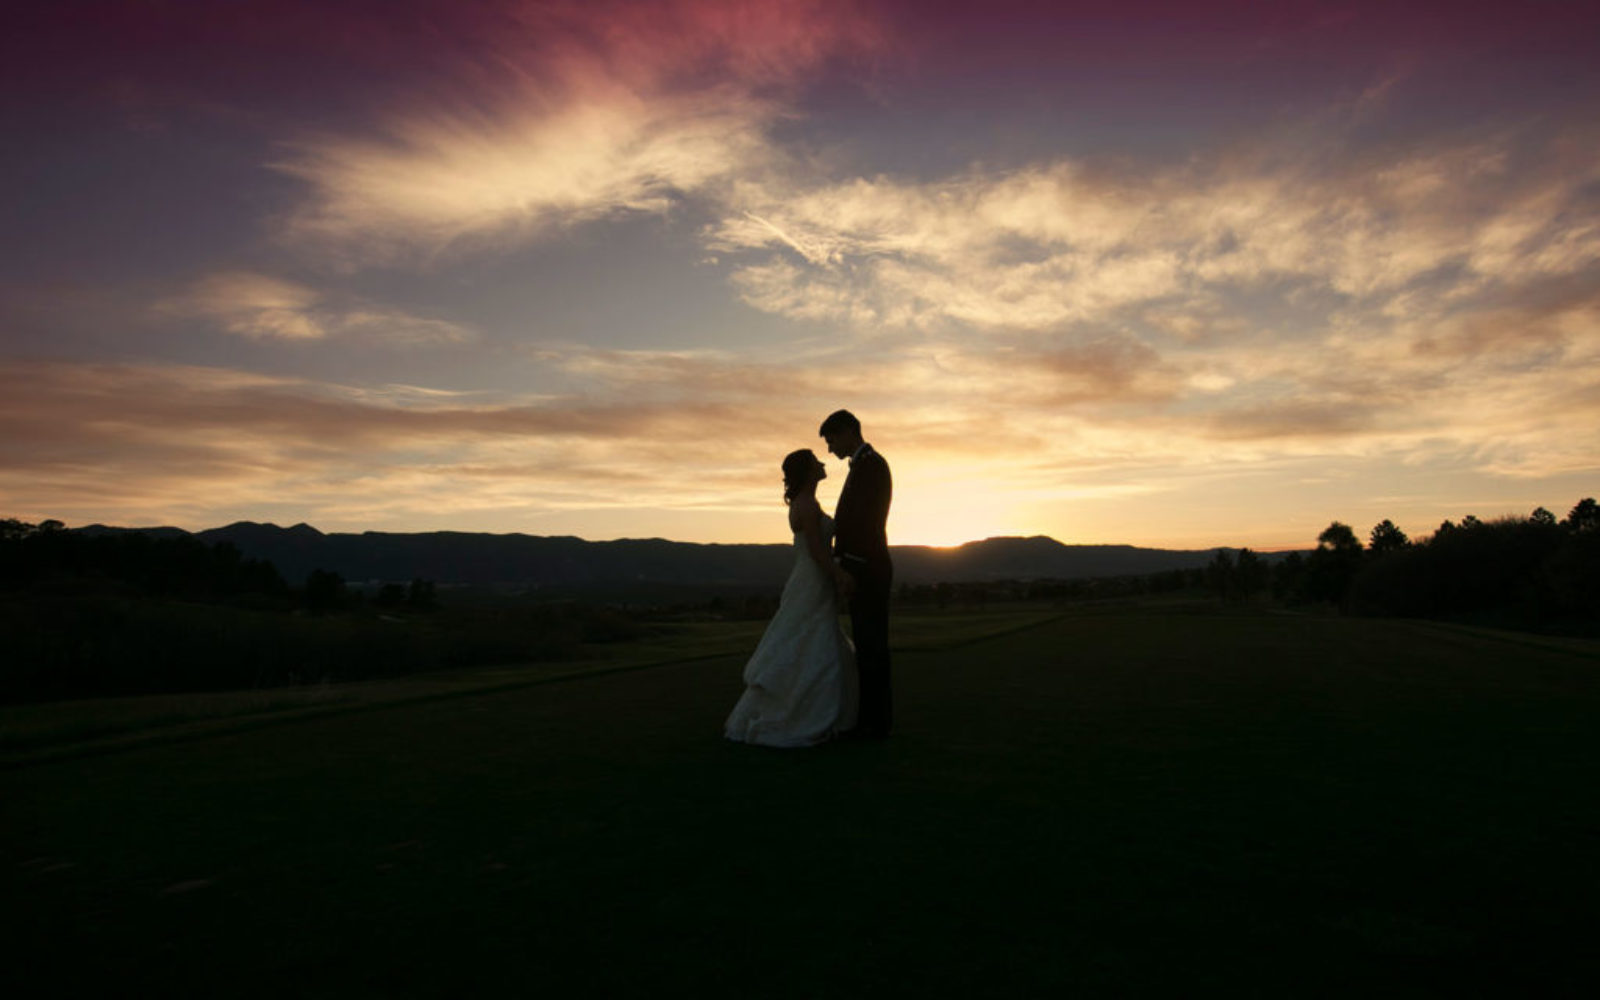 weddingphotographycoloradosprings_57-1024x640